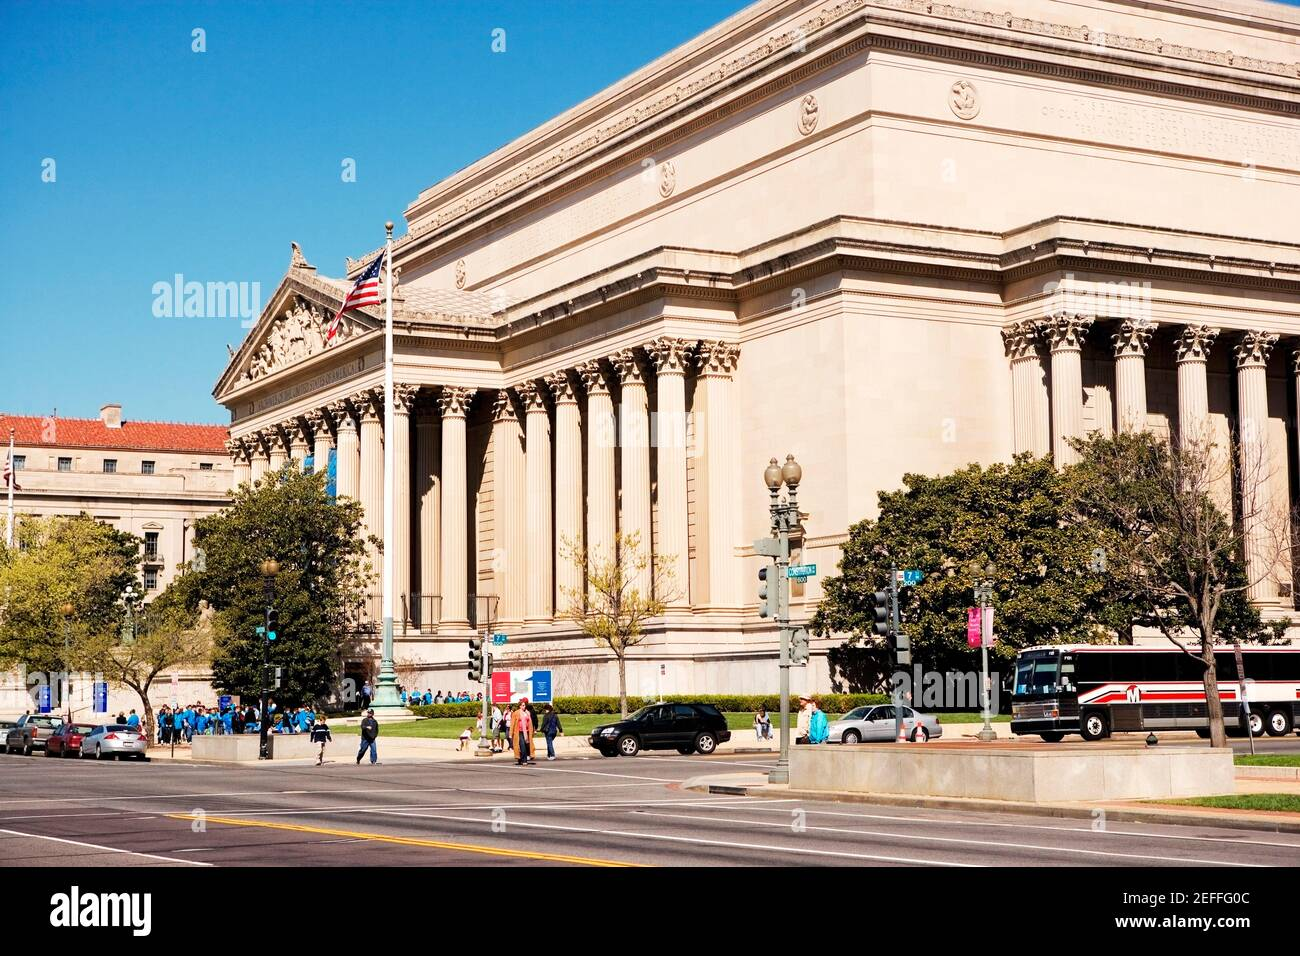 Façade du National Archives Building, Washington DC, USA, Washington DC, USA Banque D'Images